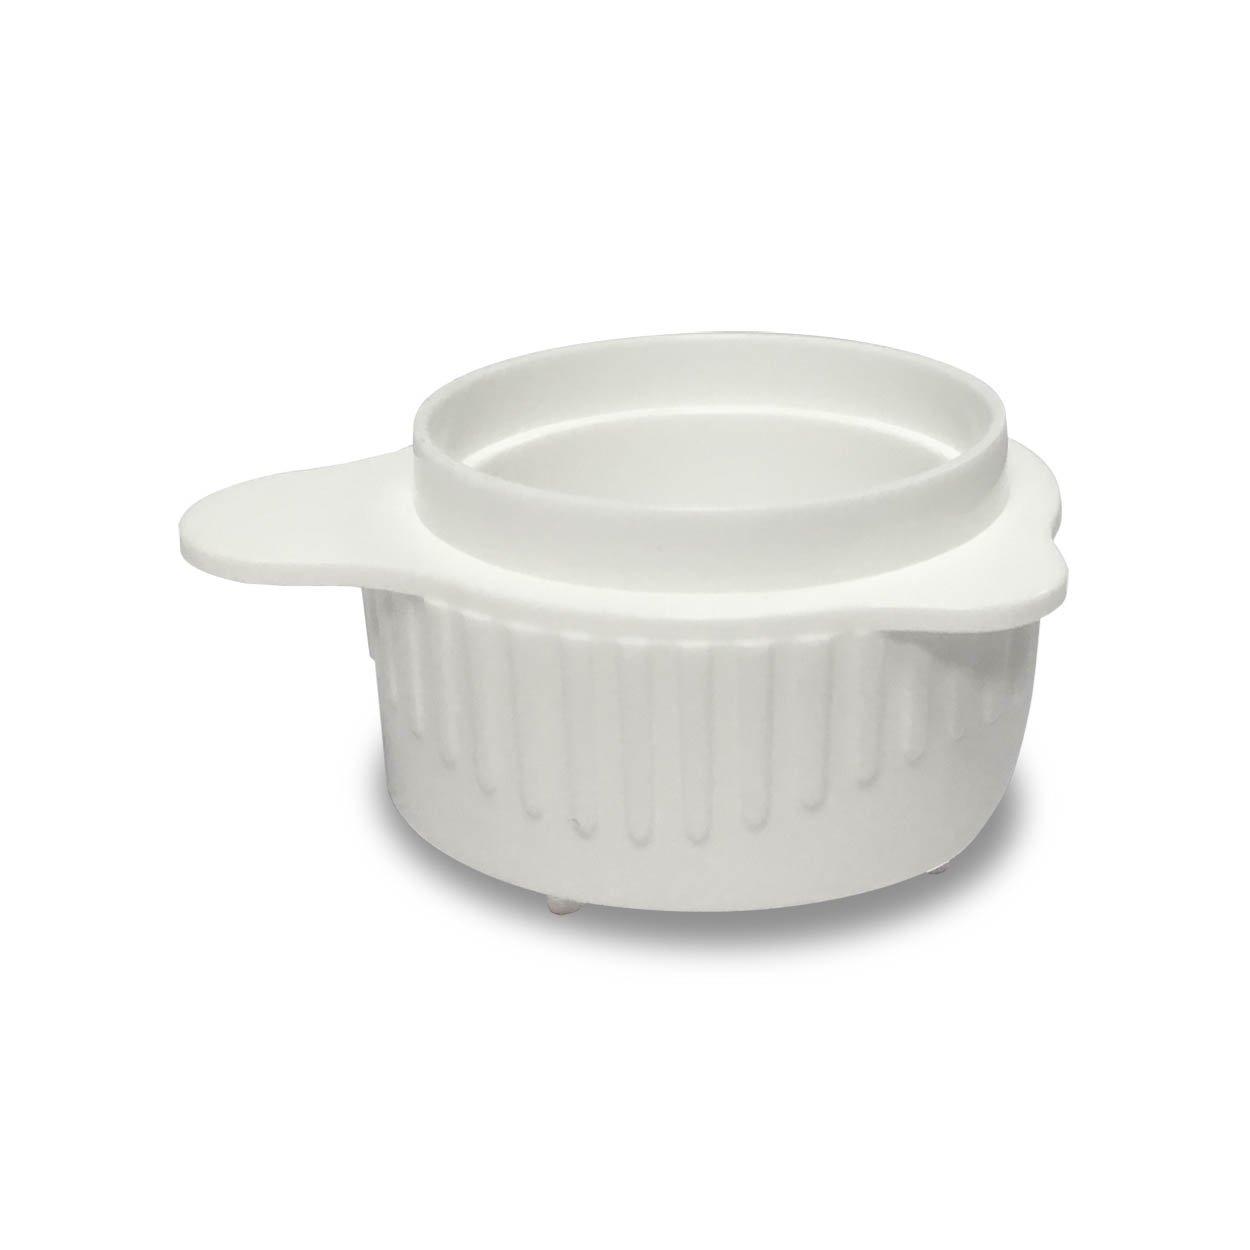 SureStrain 70um Premium Cell Strainer - White (50 Strainers & 1 Reducing Adapter/Pack)